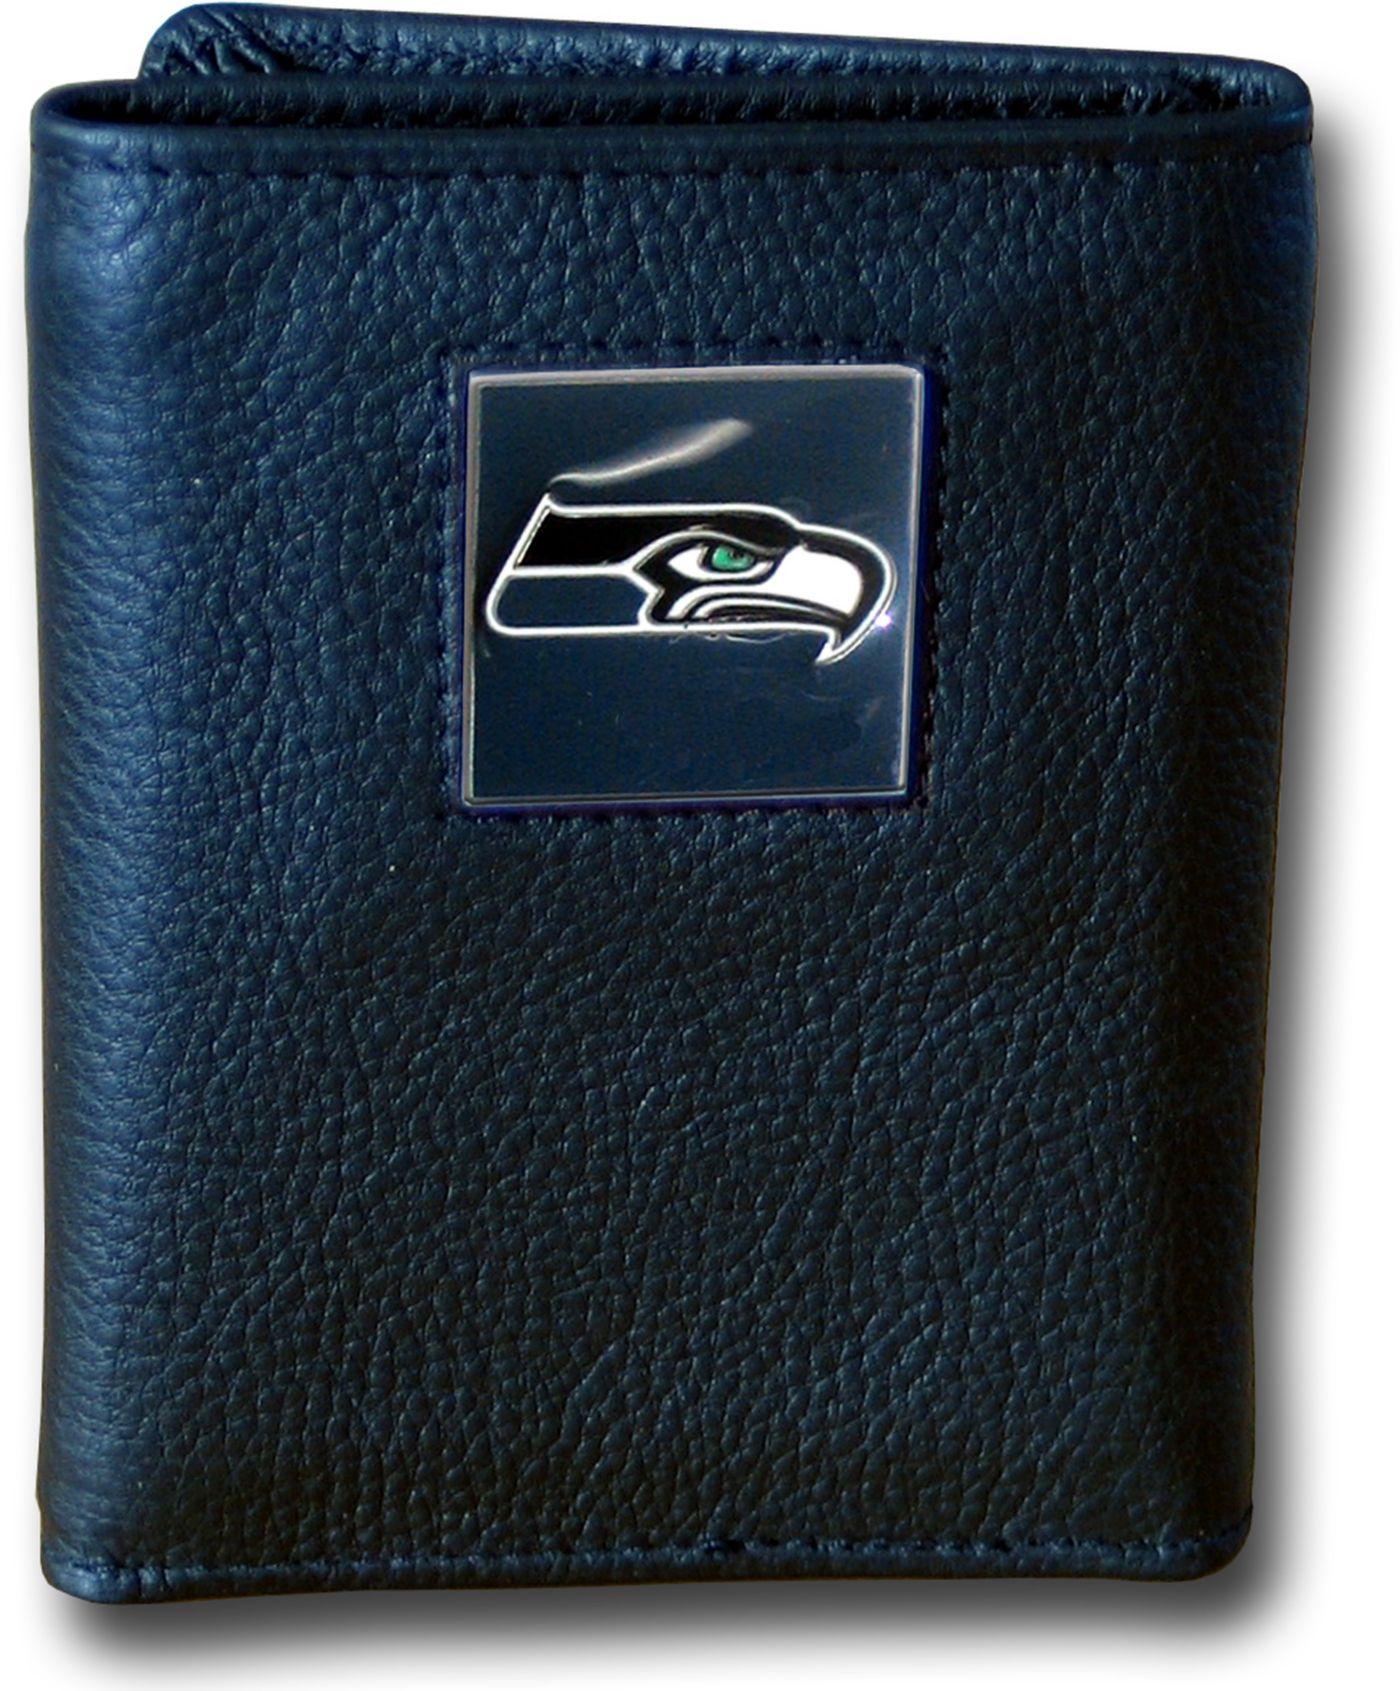 Siskiyou Gifts Seattle Seahawks Executive Tri-Fold Wallet